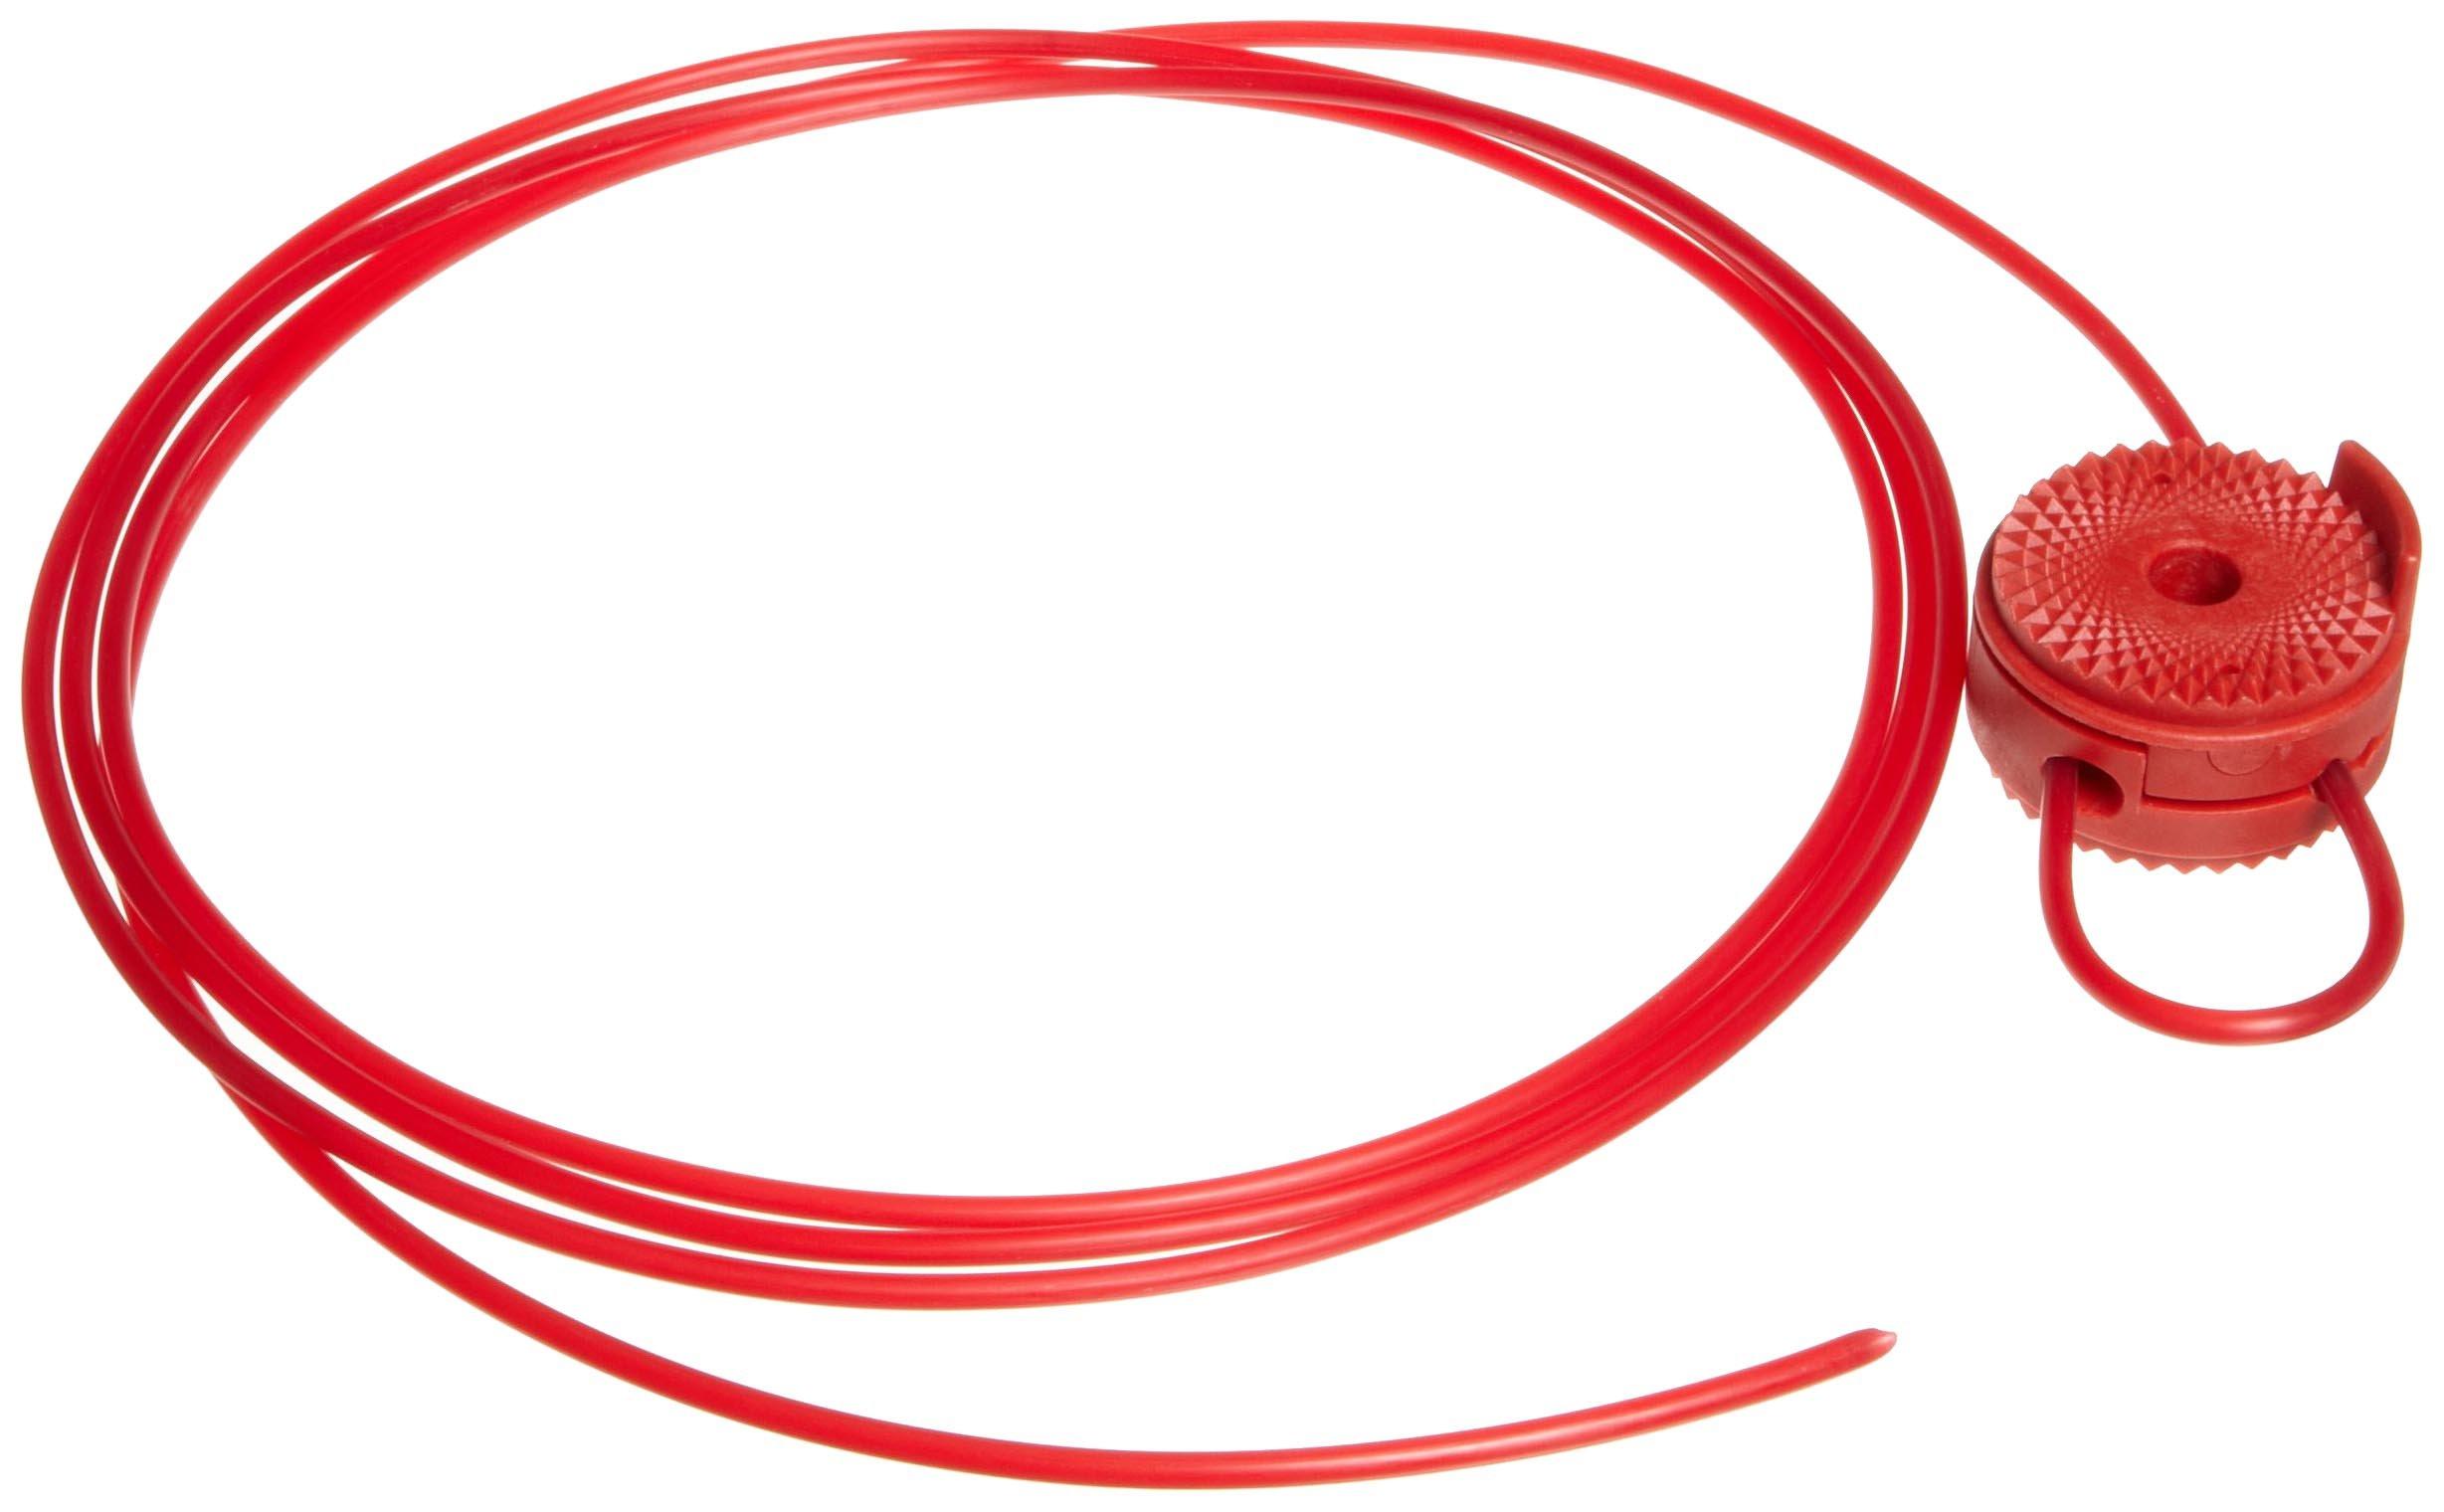 Brady Cable Lockout, 1/8'' Diameter, 8' Length, Nonconductive Nylon Cable